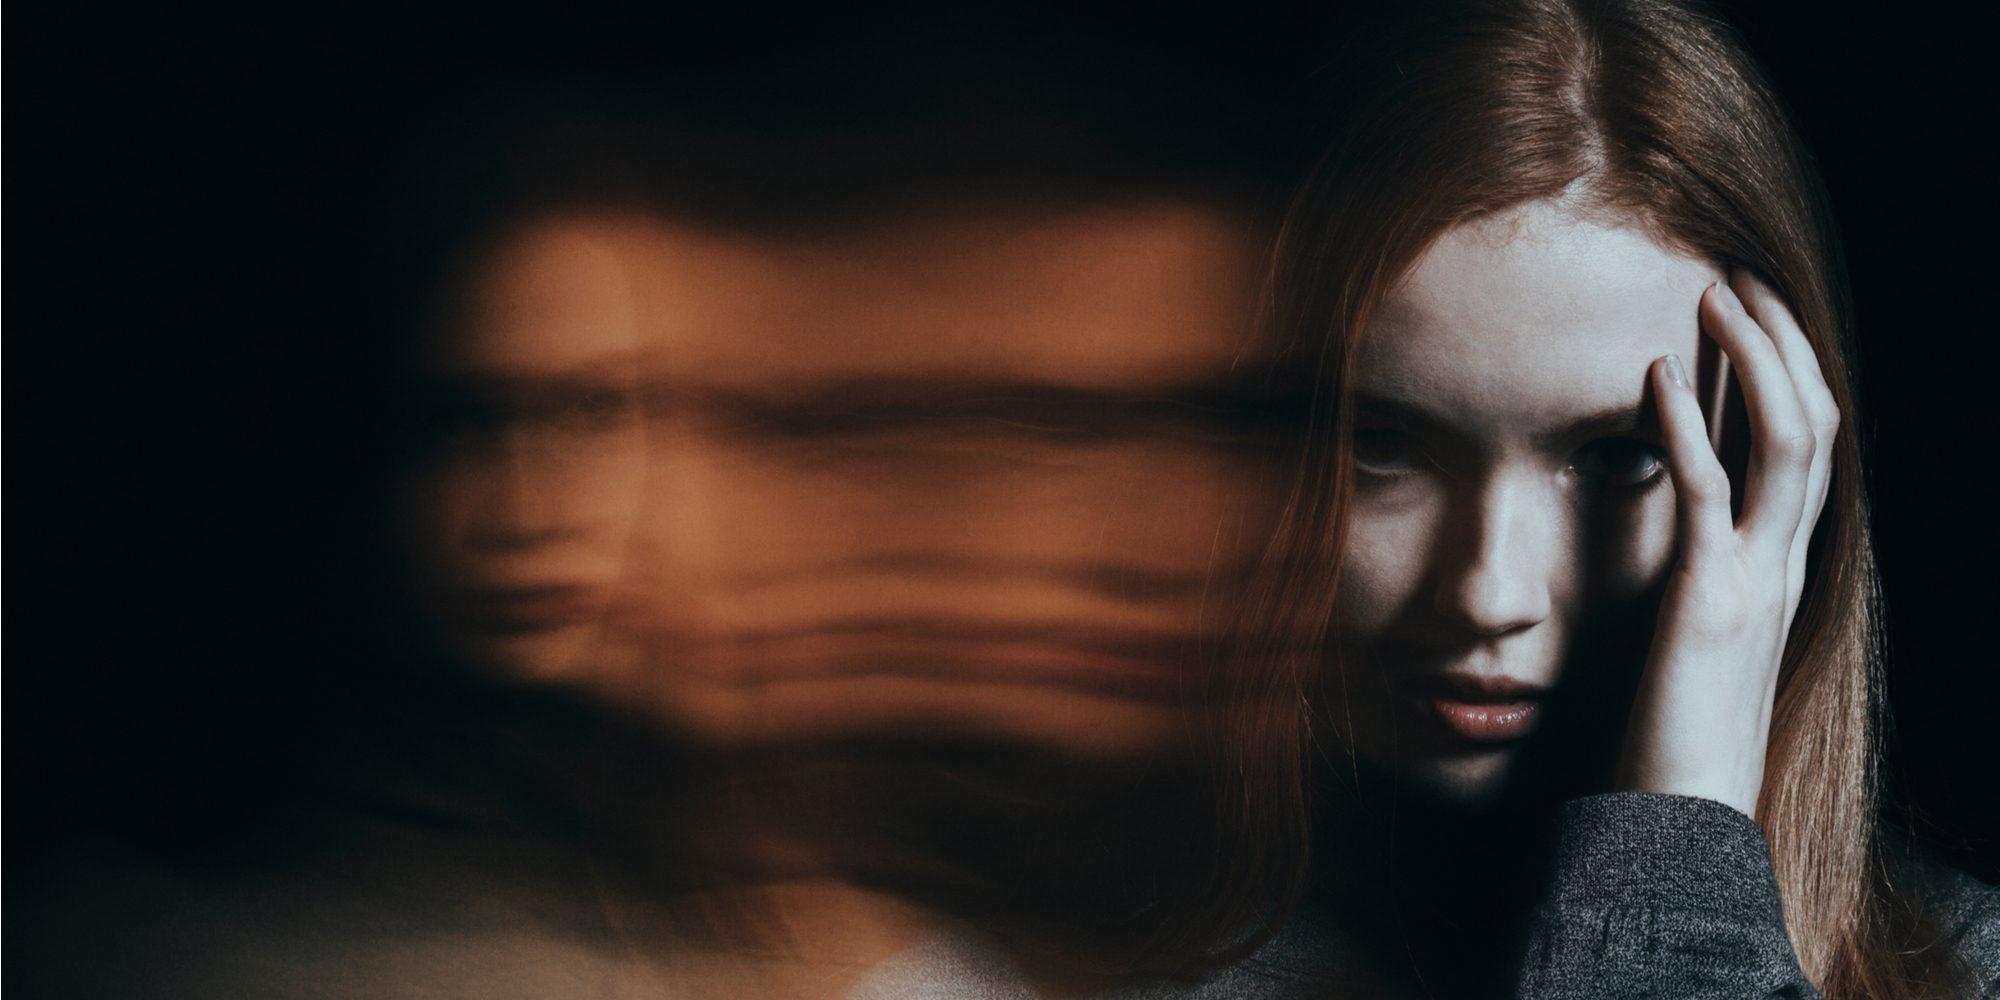 Delusion vs Hallucination